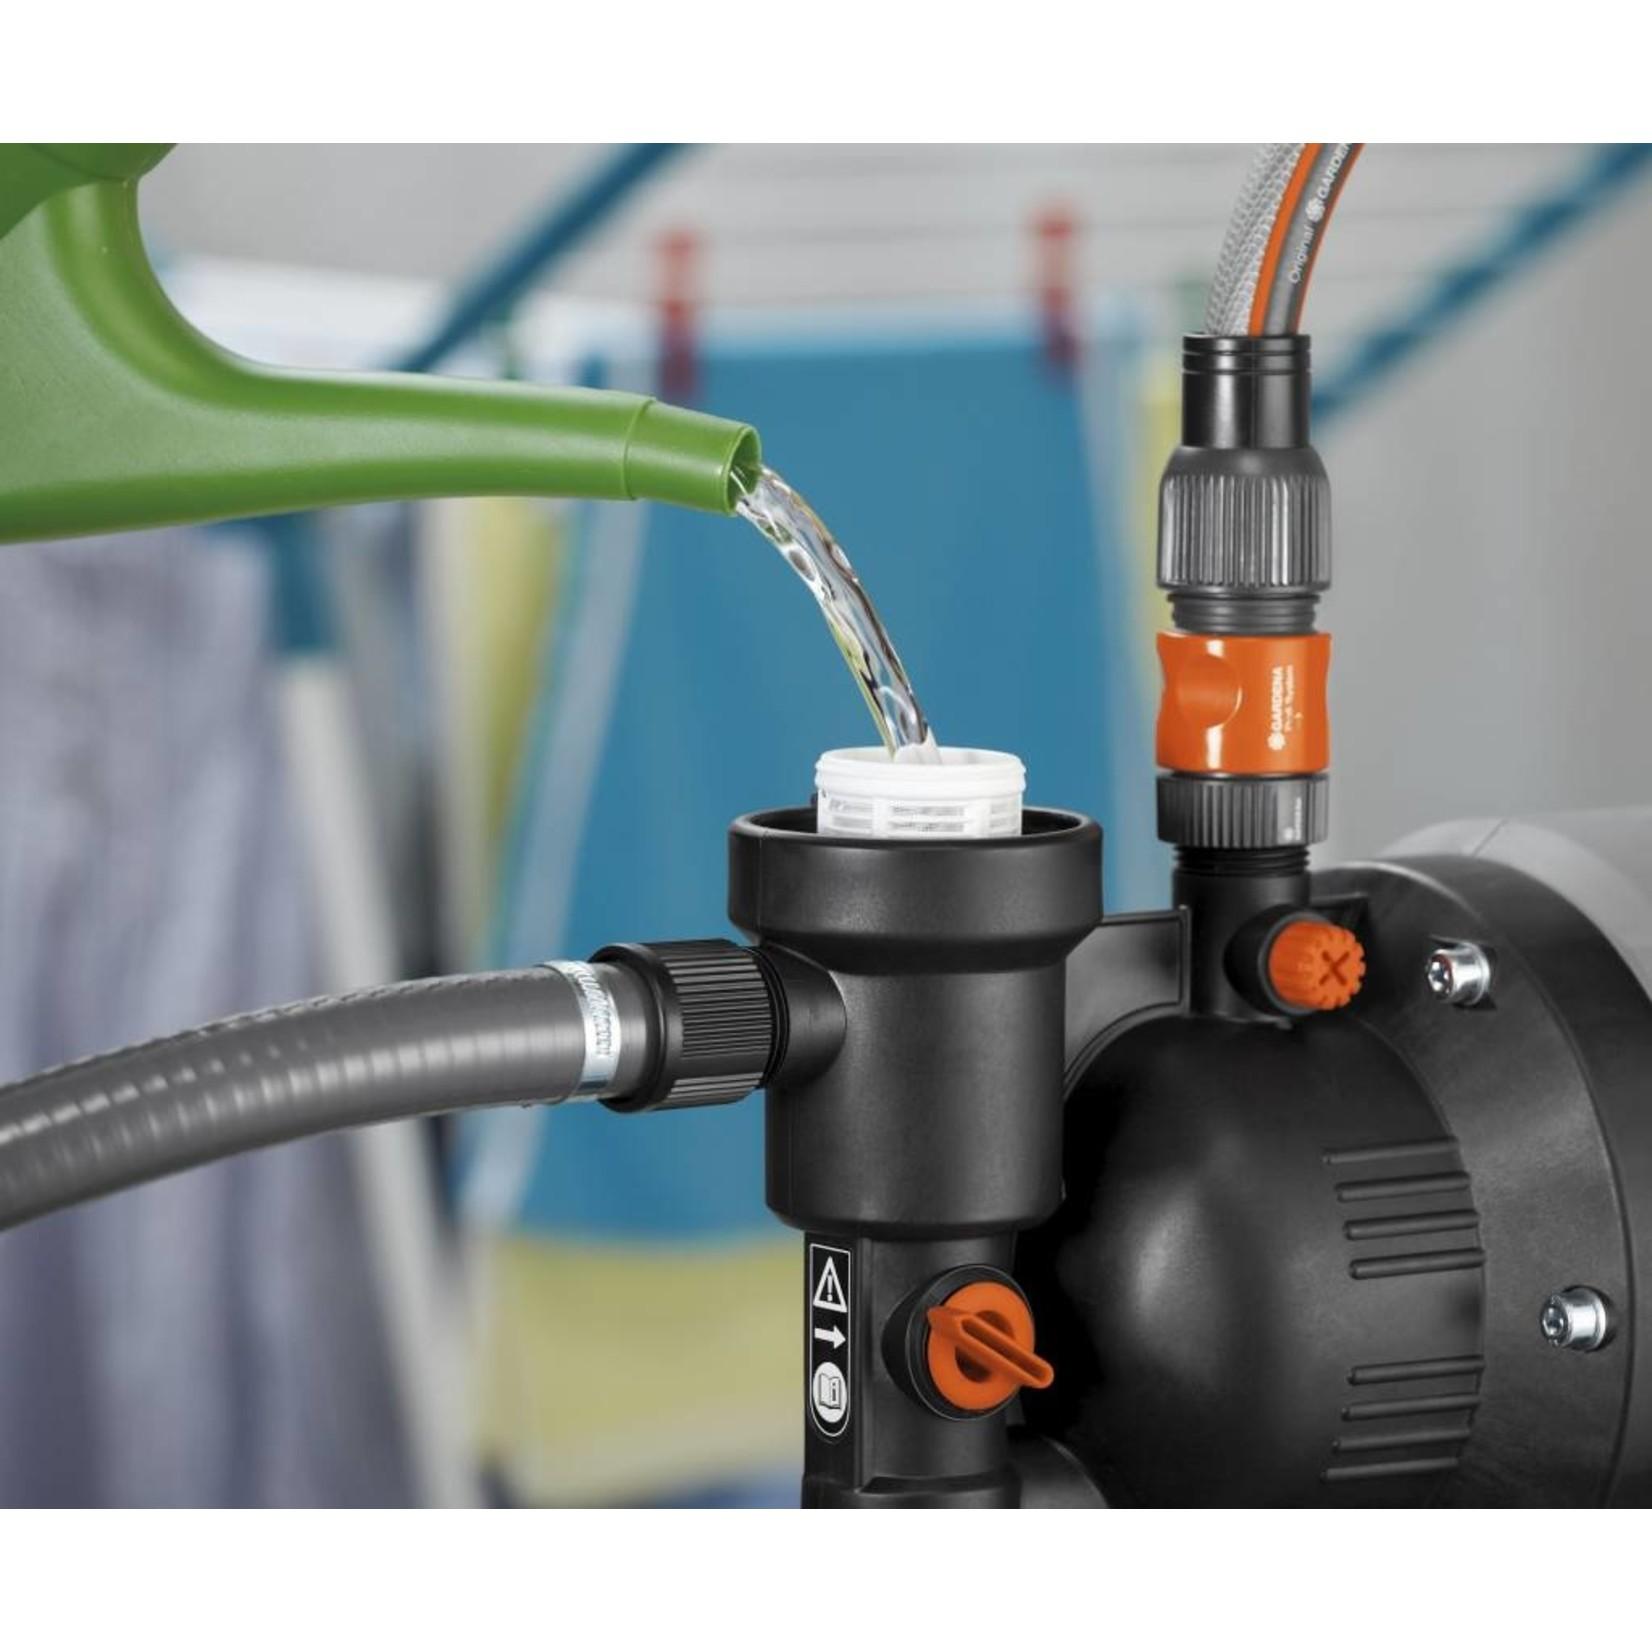 Gardena Gardena Classic hydrofoorpomp met watertank 3000/4 eco